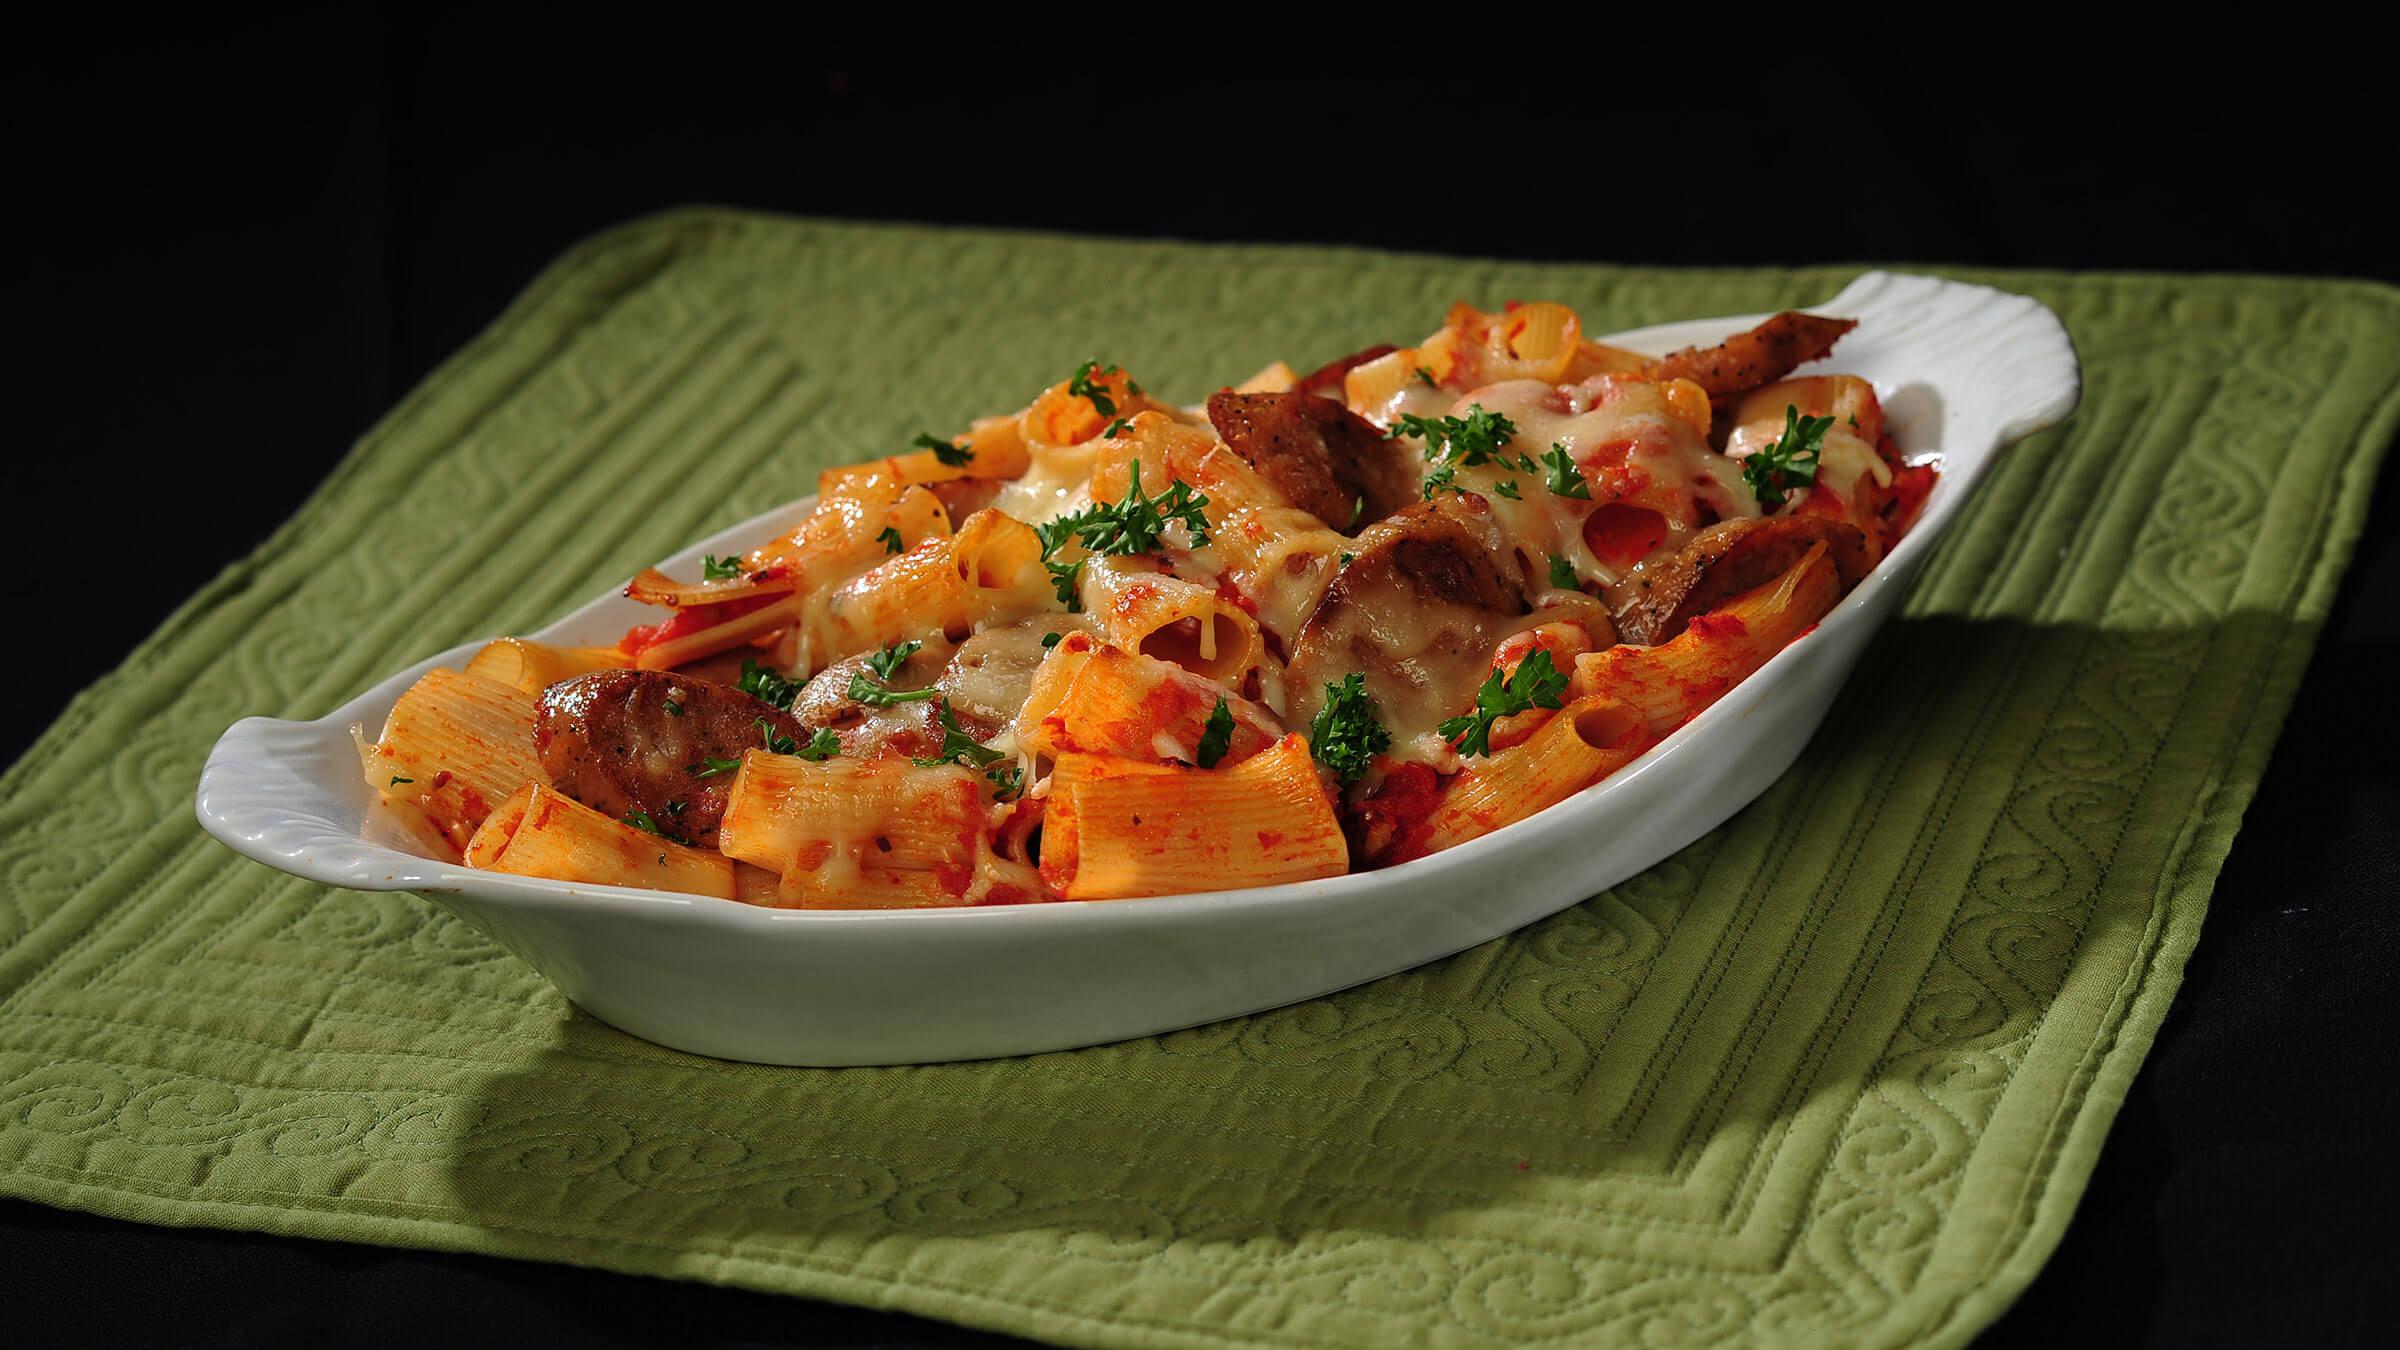 Italian Chicken Sausage Recipes  Italian Chicken Sausage and Pasta Casserole